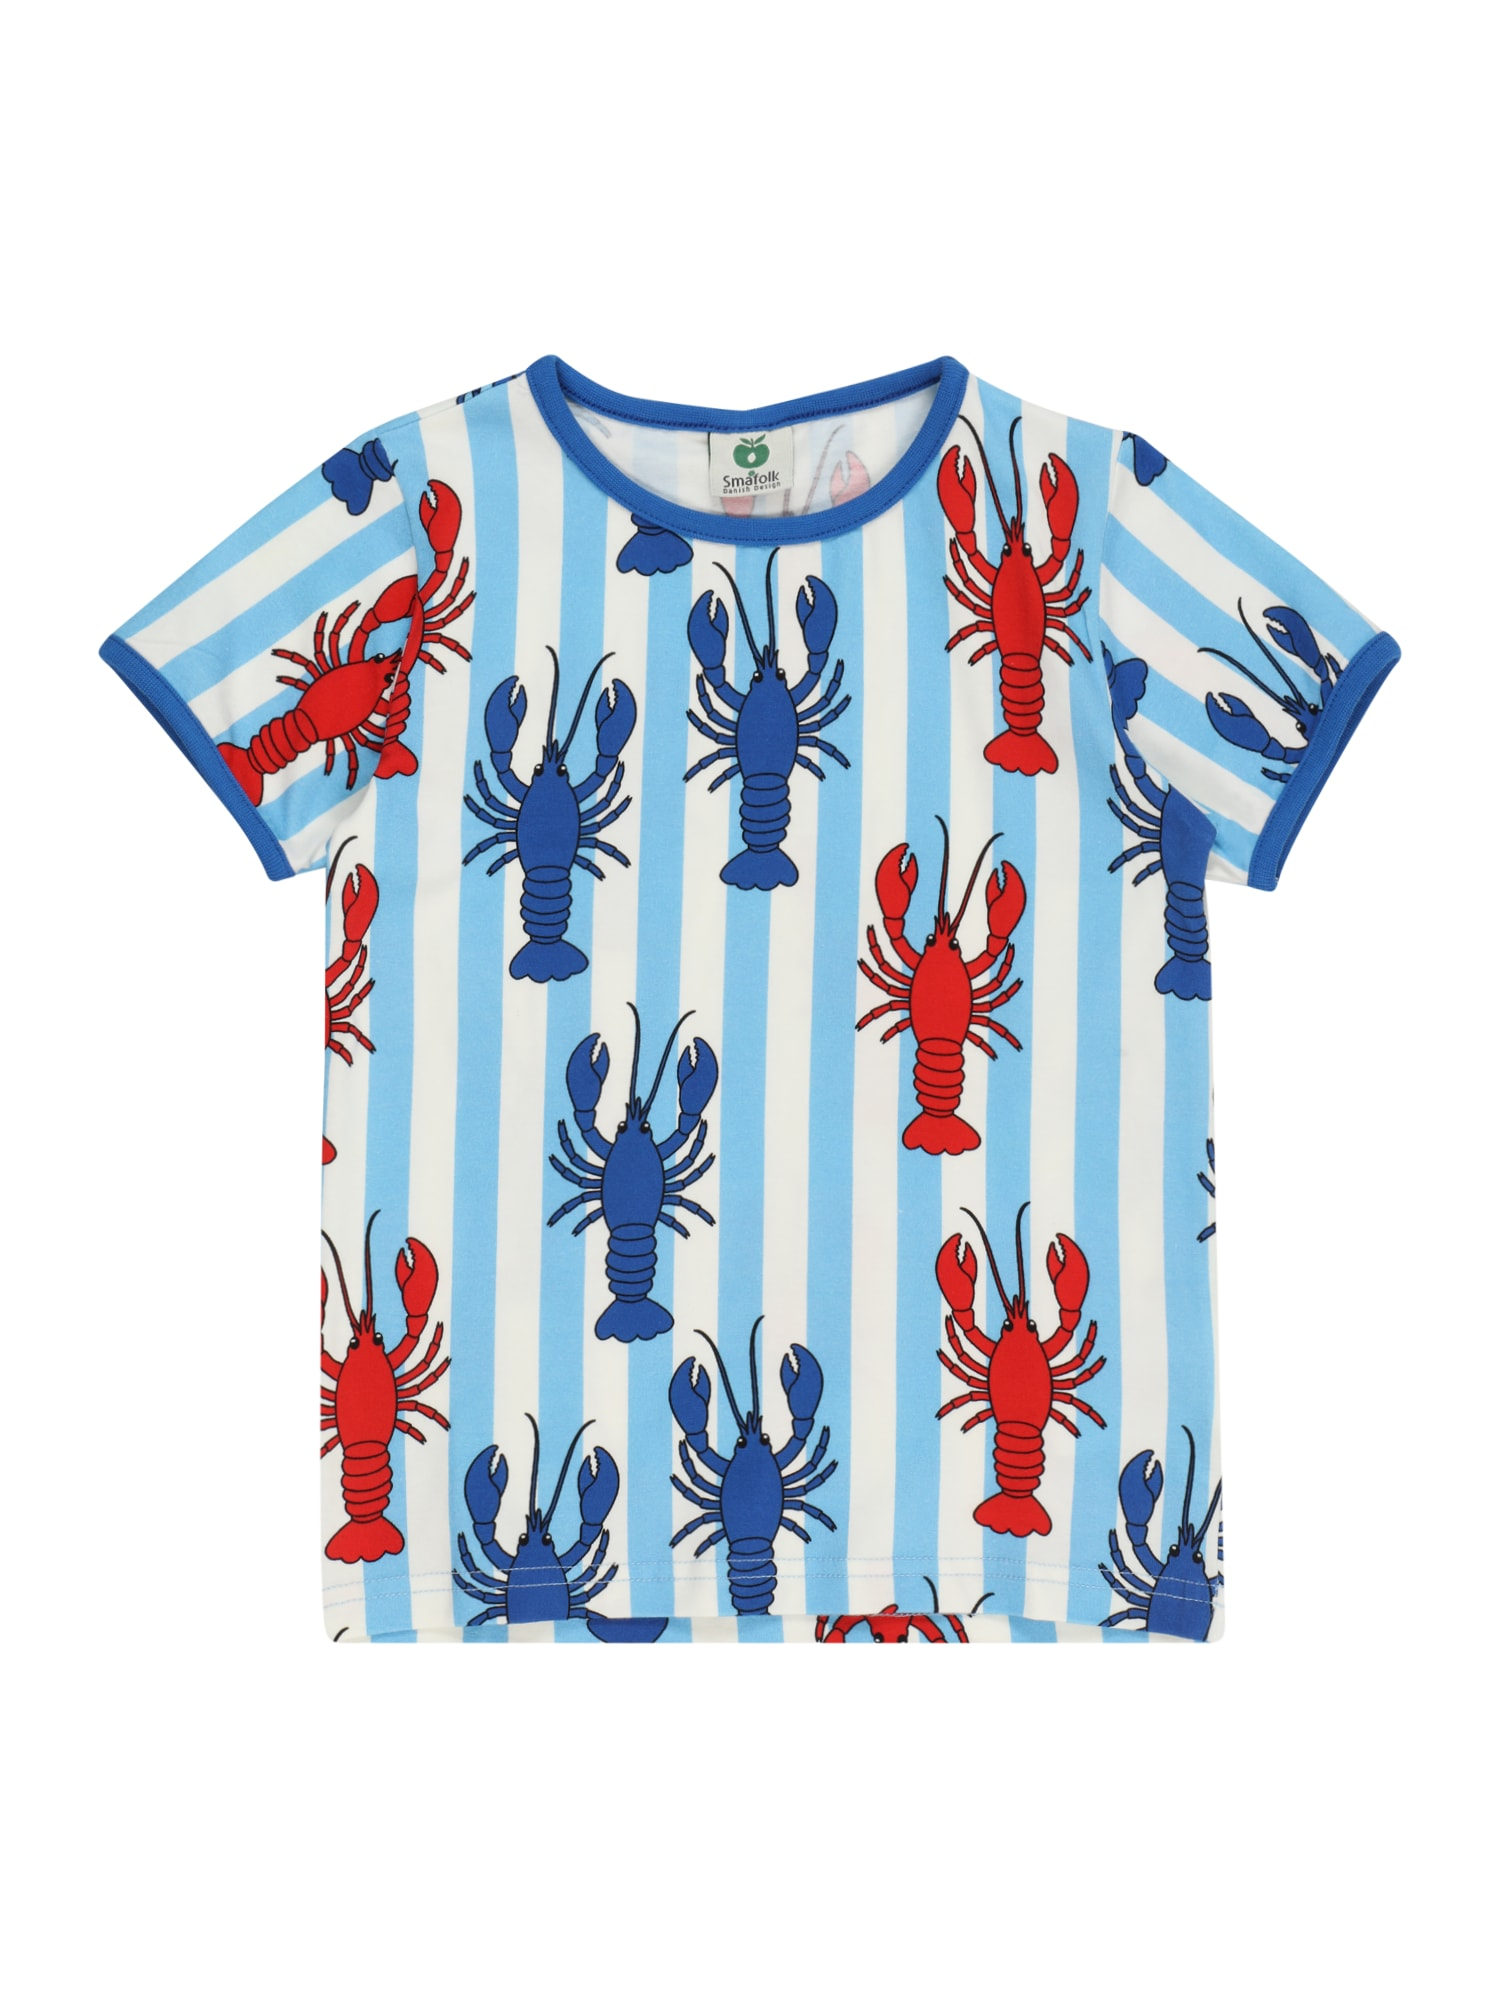 Småfolk Marškinėliai mėlyna / raudona / balta / šviesiai mėlyna